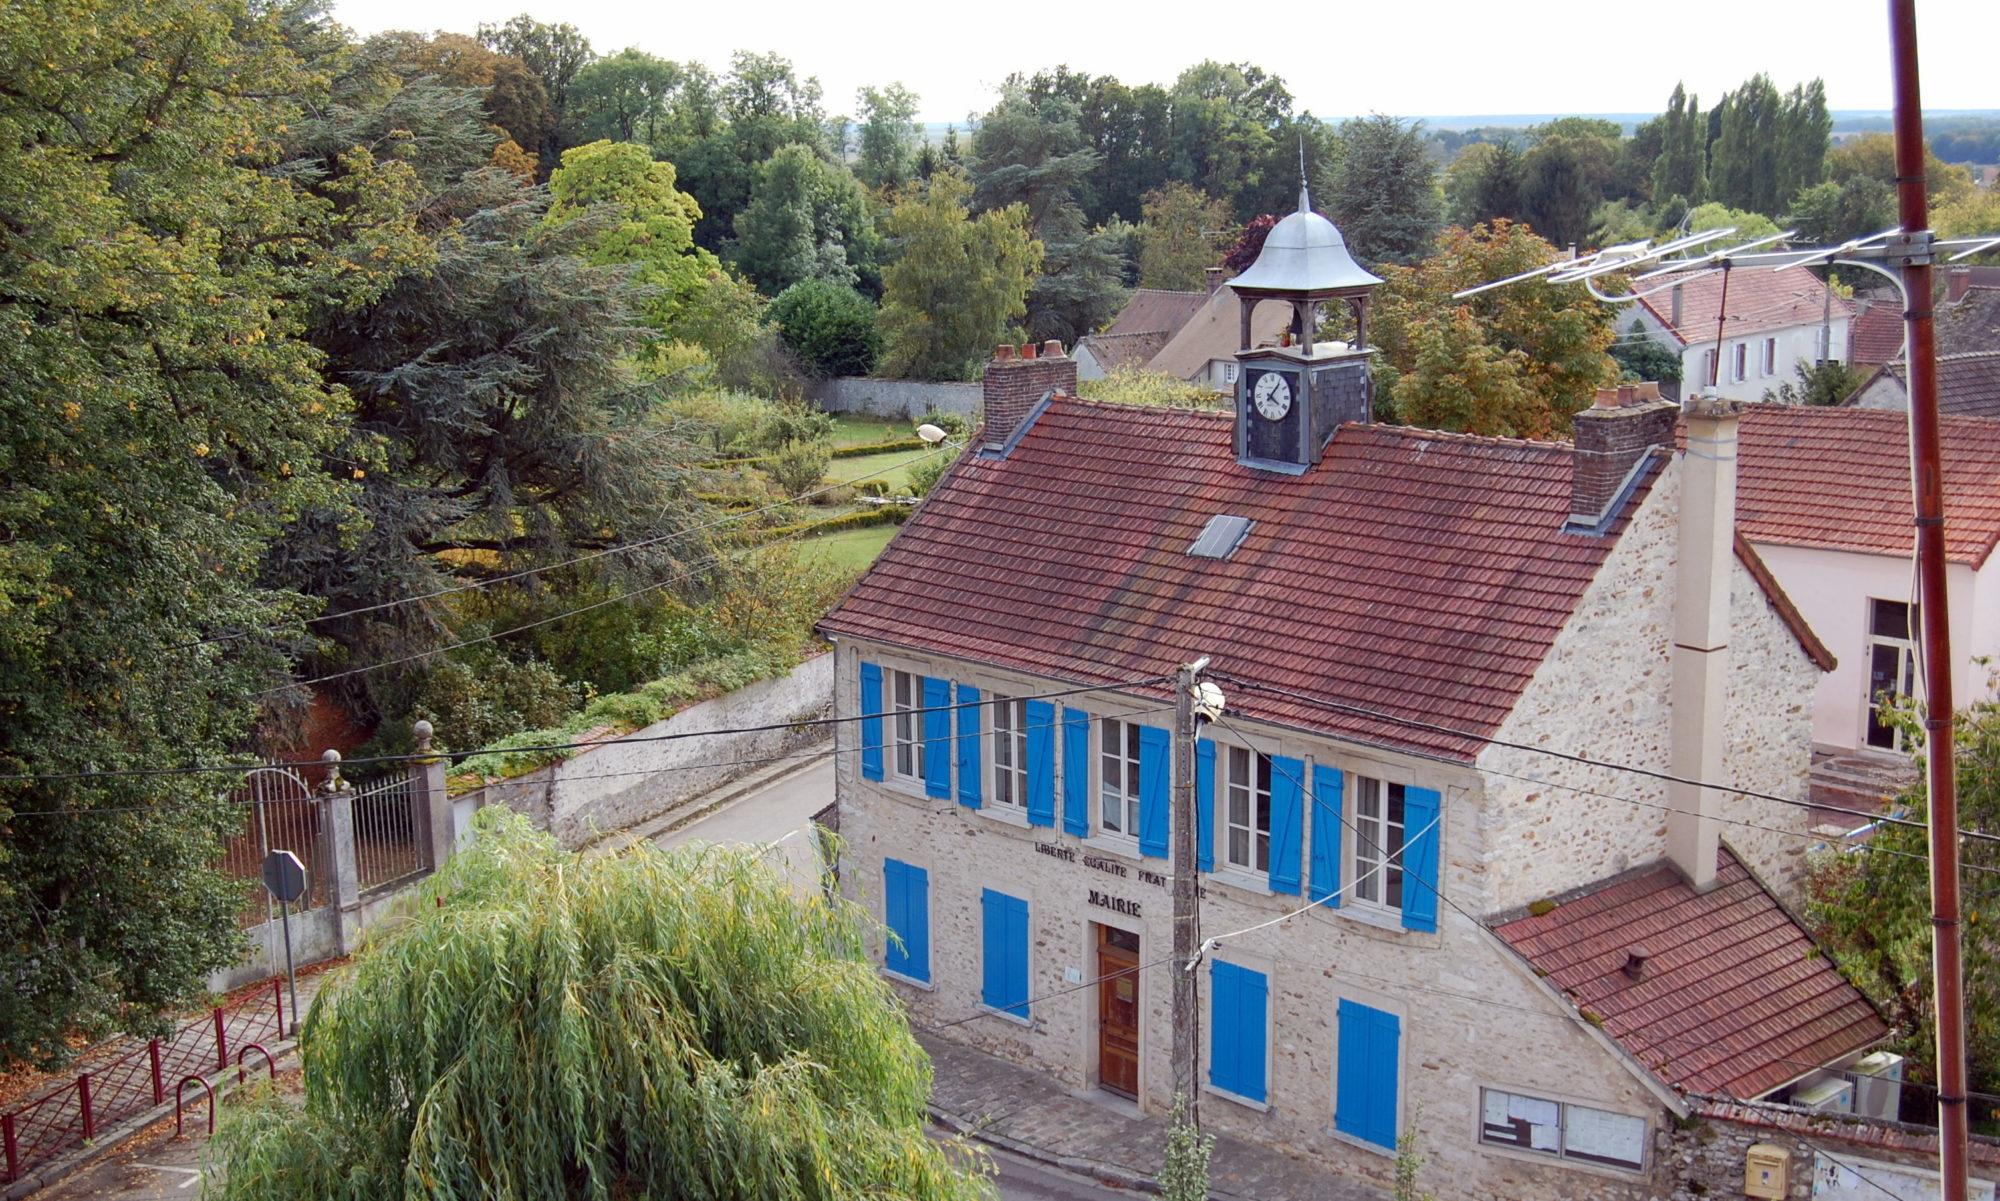 cropped-1cravent-mairie-octobre2012-e1521912703891.jpg